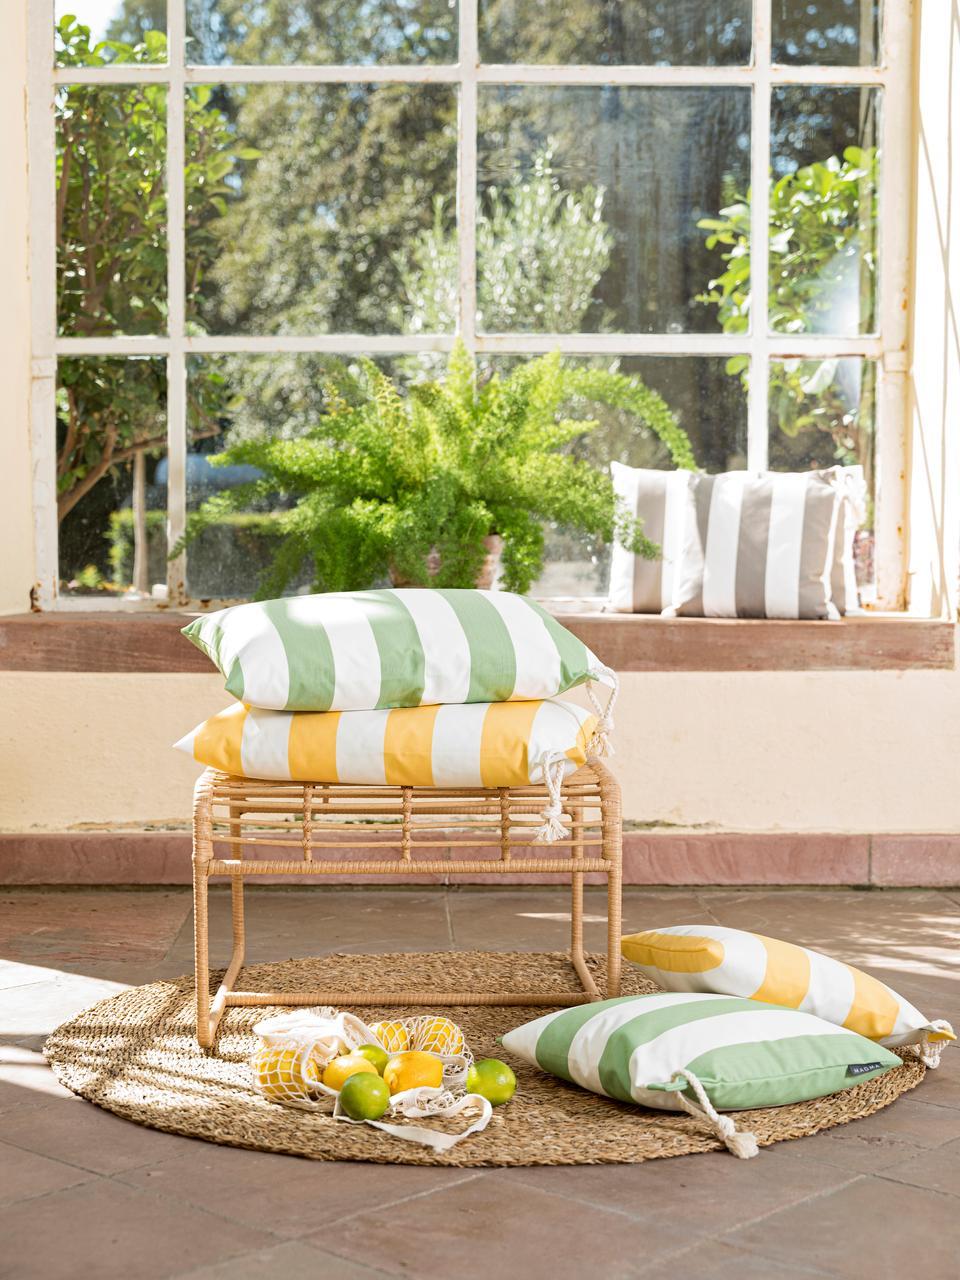 Gestreifte Outdoor-Kissenhülle Santorin in Gelb/Weiß, 100% Polypropylen, Teflon® beschichtet, Gelb, Weiß, 40 x 60 cm